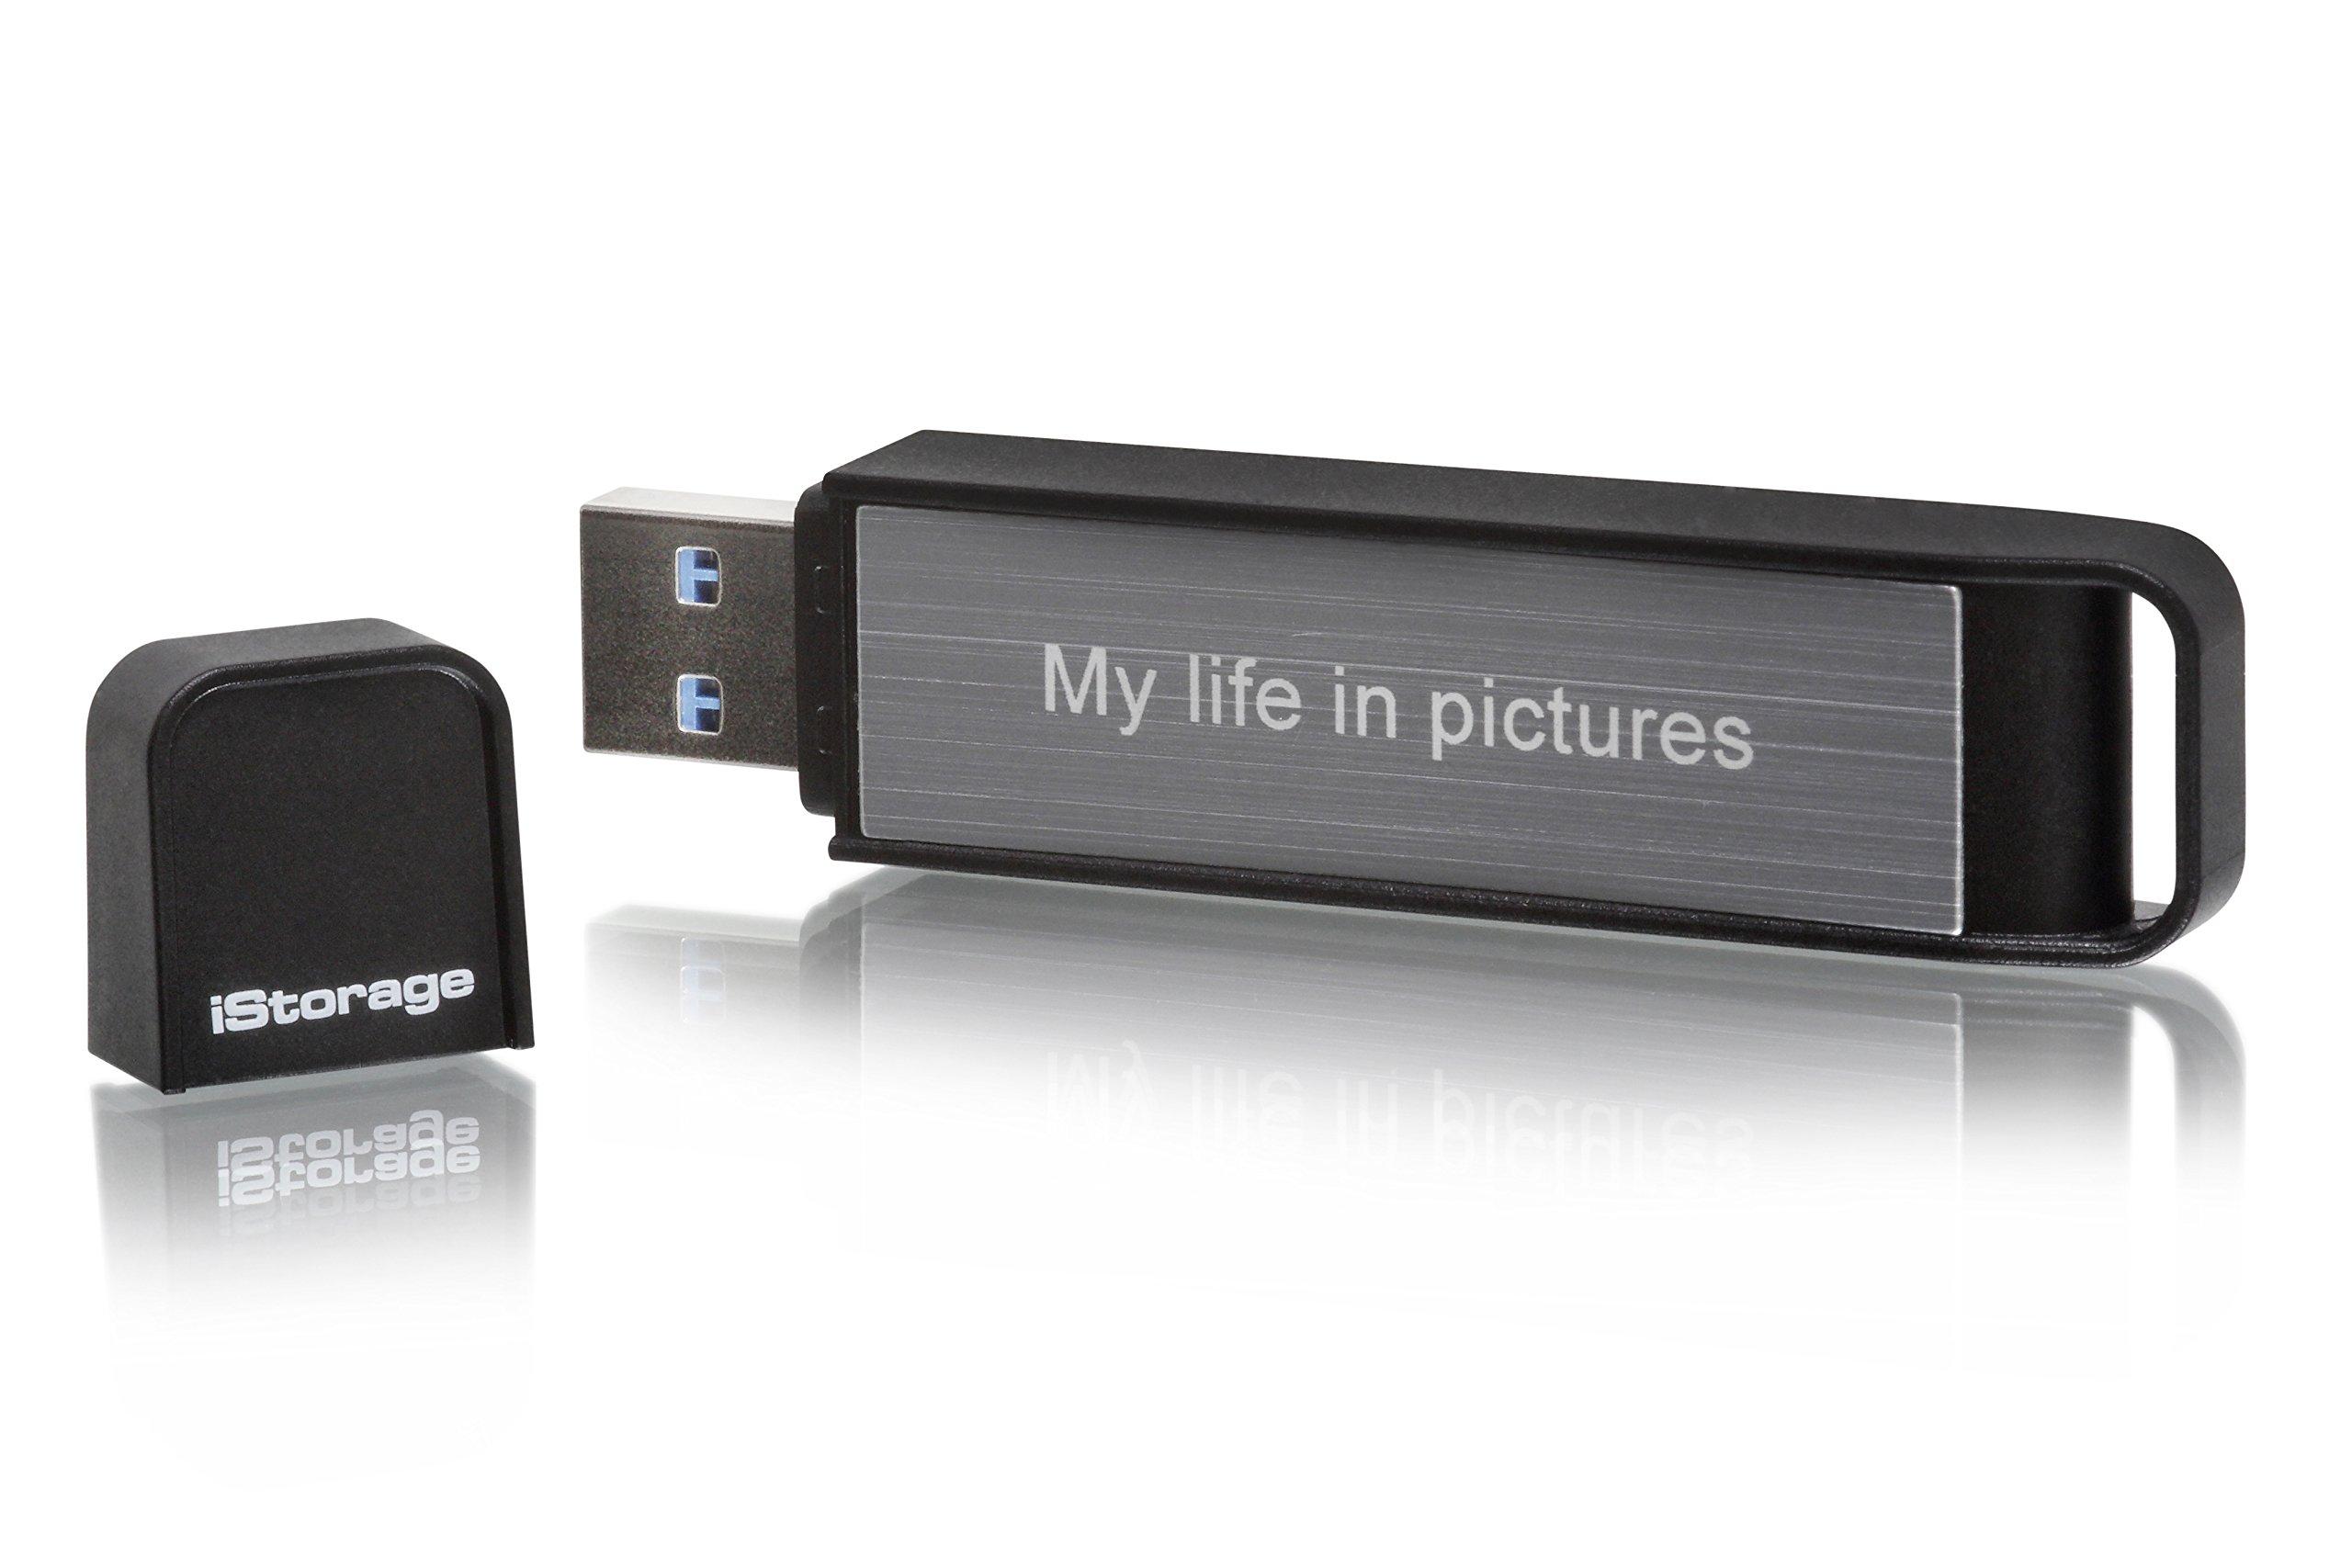 iStorage 64GB datAshur Personal 2 USB 3.0 Encrypted Flash Drive by iStorage